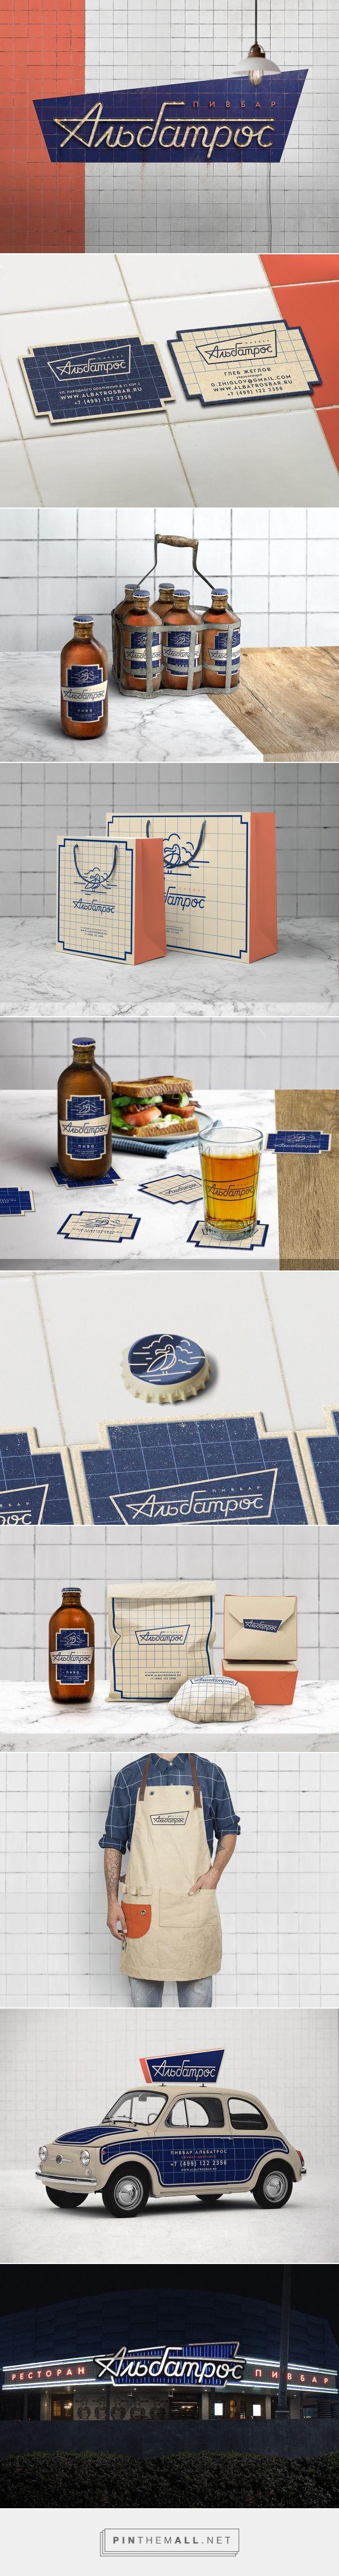 Albatros Gastro Pub Branding by Igor Khrupin | Fivestar Branding Agency – Design and Branding Agency & Curated Inspiration Gallery